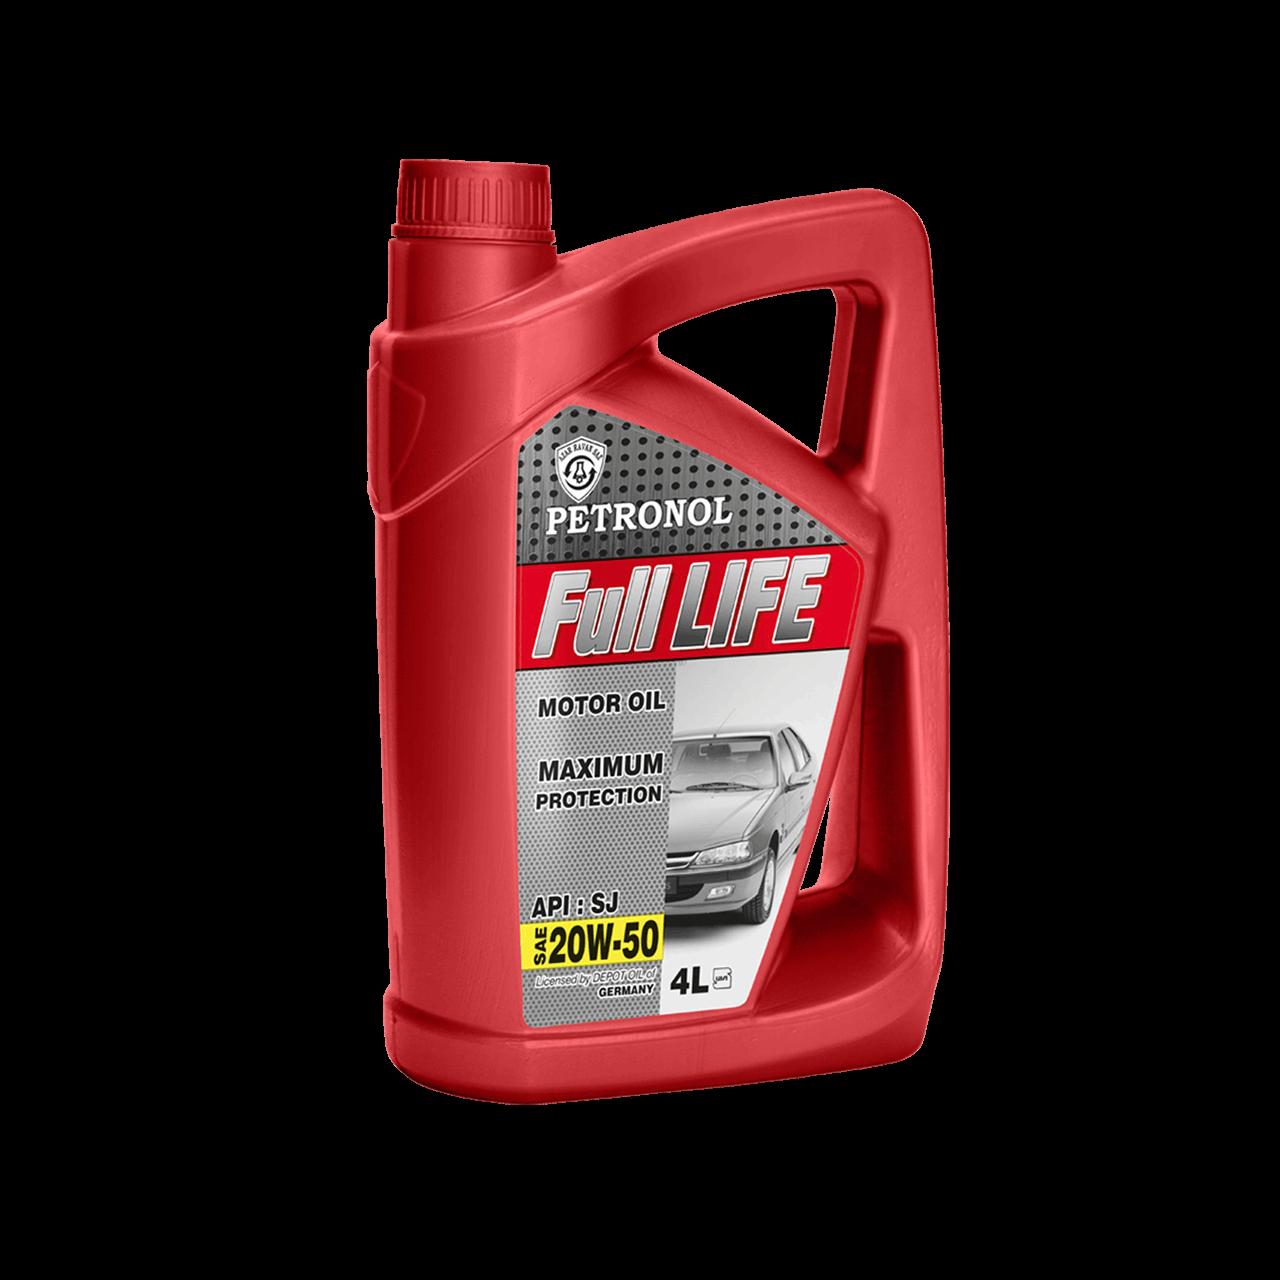 روغن موتور خودرو پترونول مدل فول لایف SAE 20W-50 ظرفیت 4 لیتر